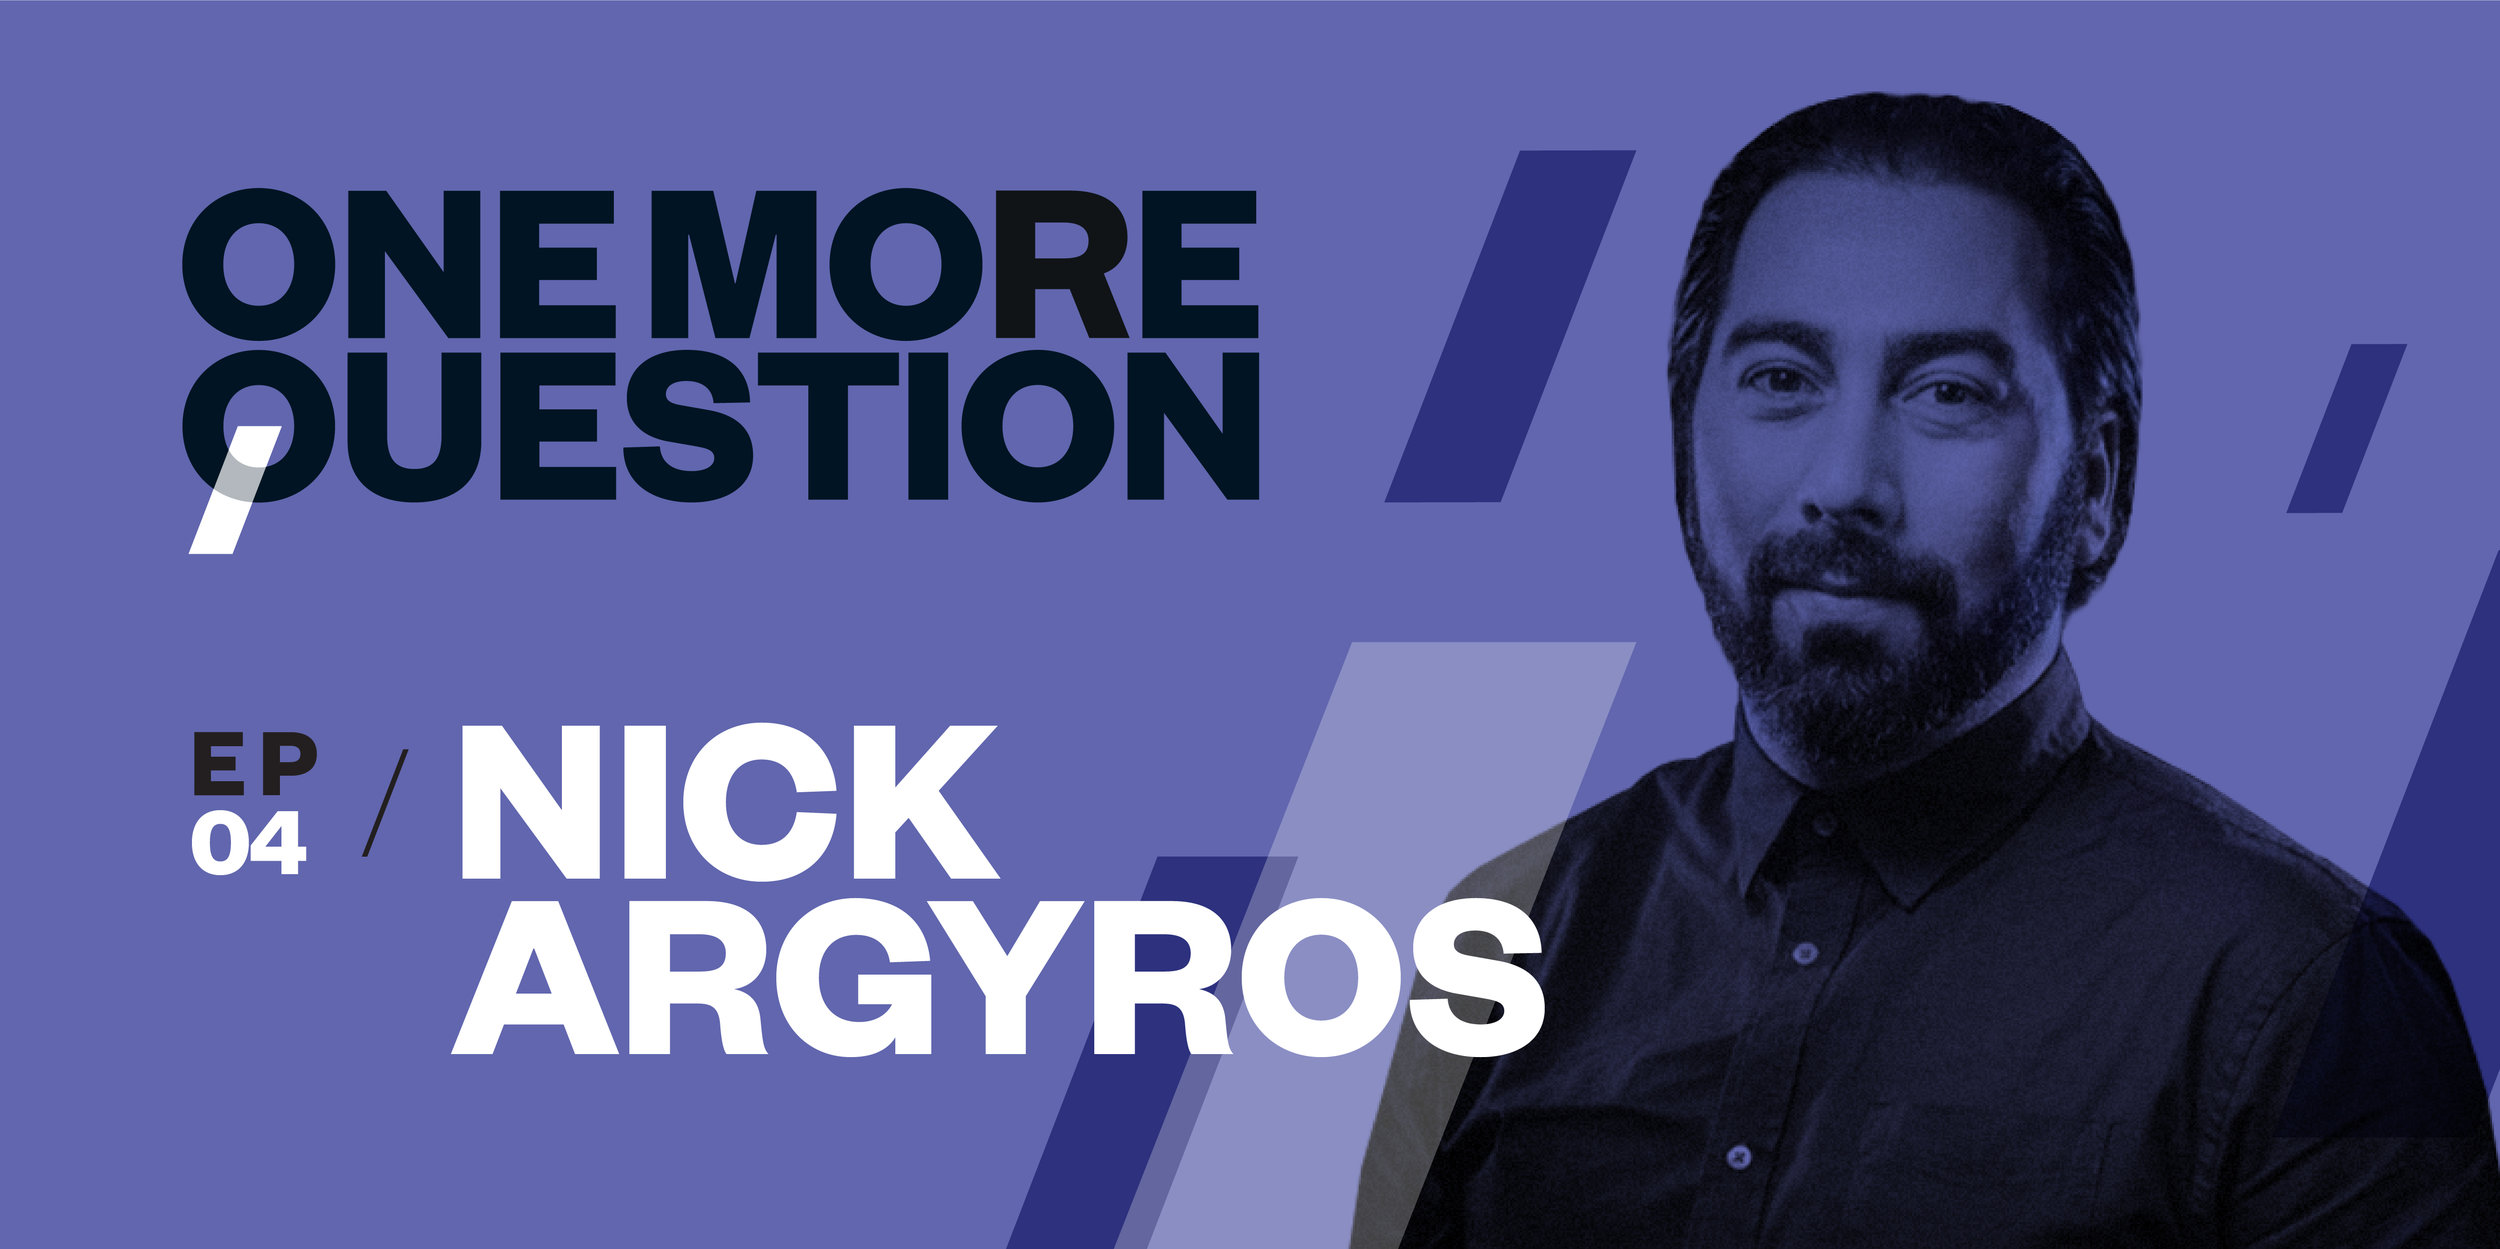 Nick Argyros